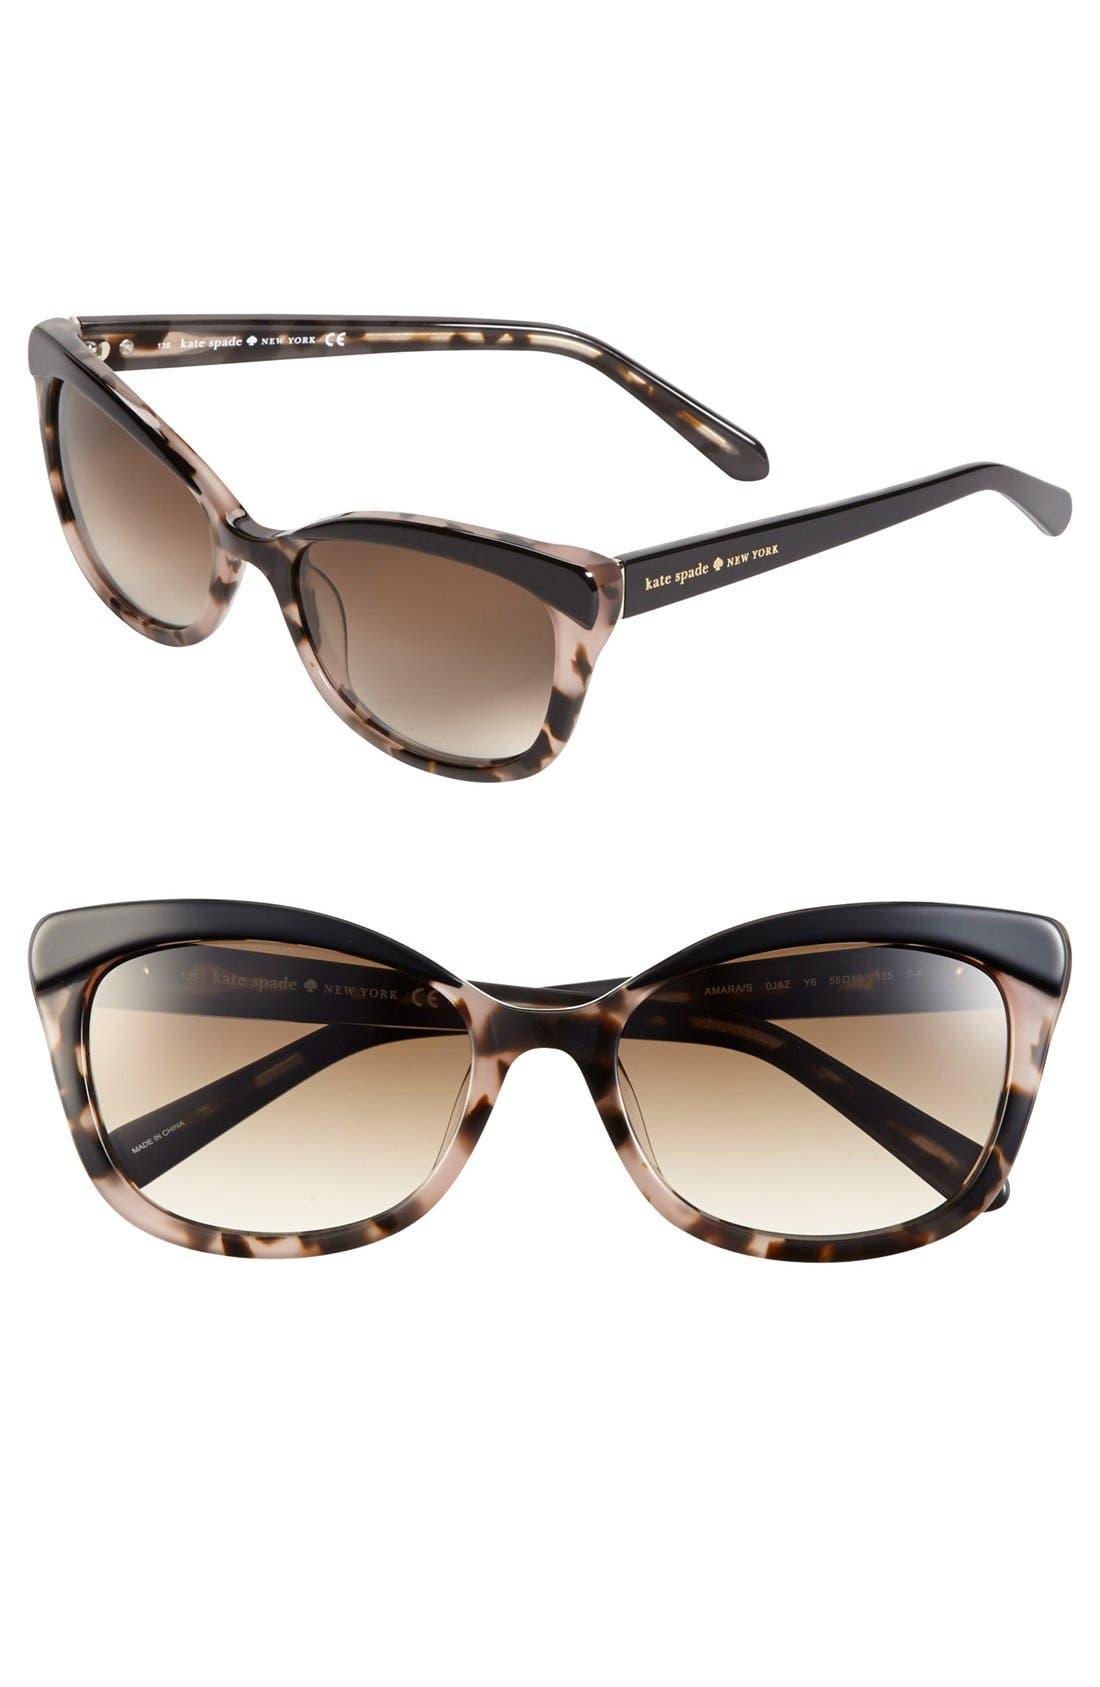 Main Image - kate spade new york 'amaras' 55mm sunglasses